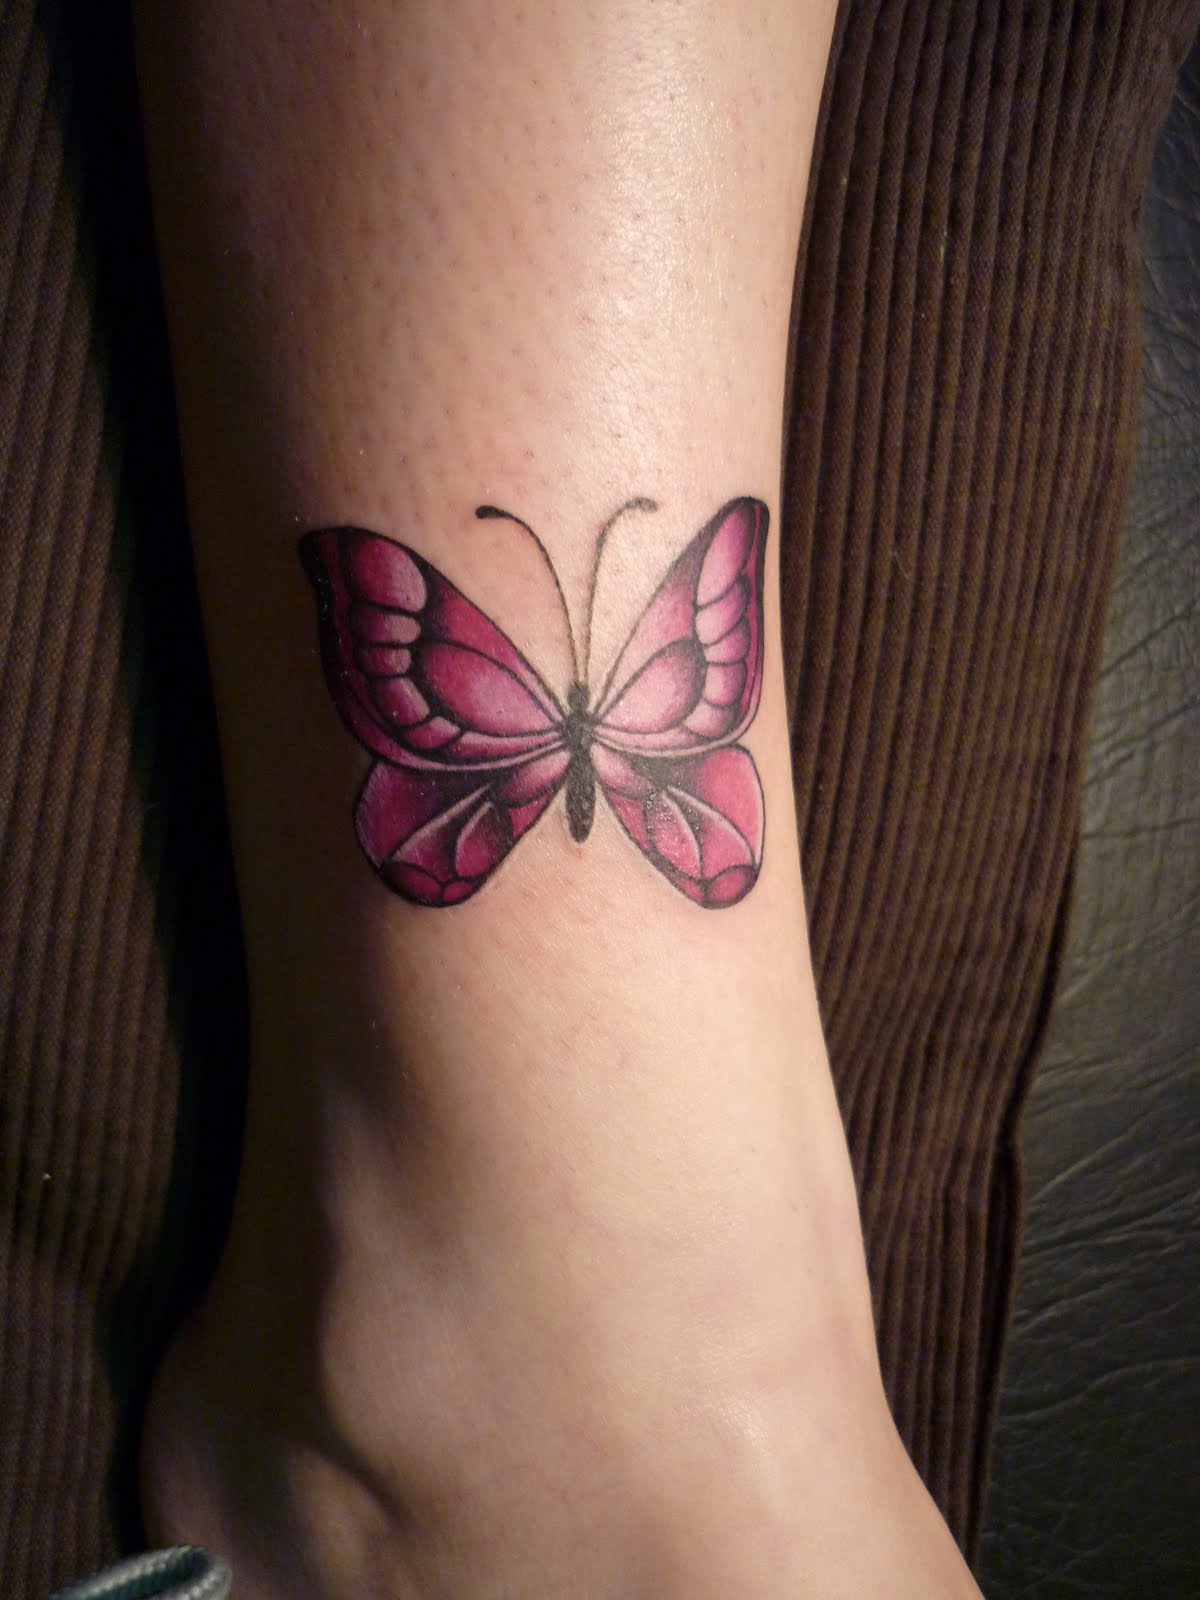 Lorien Tattoo: Tatuaje mariposas. Alas de mariposas. Tattoo